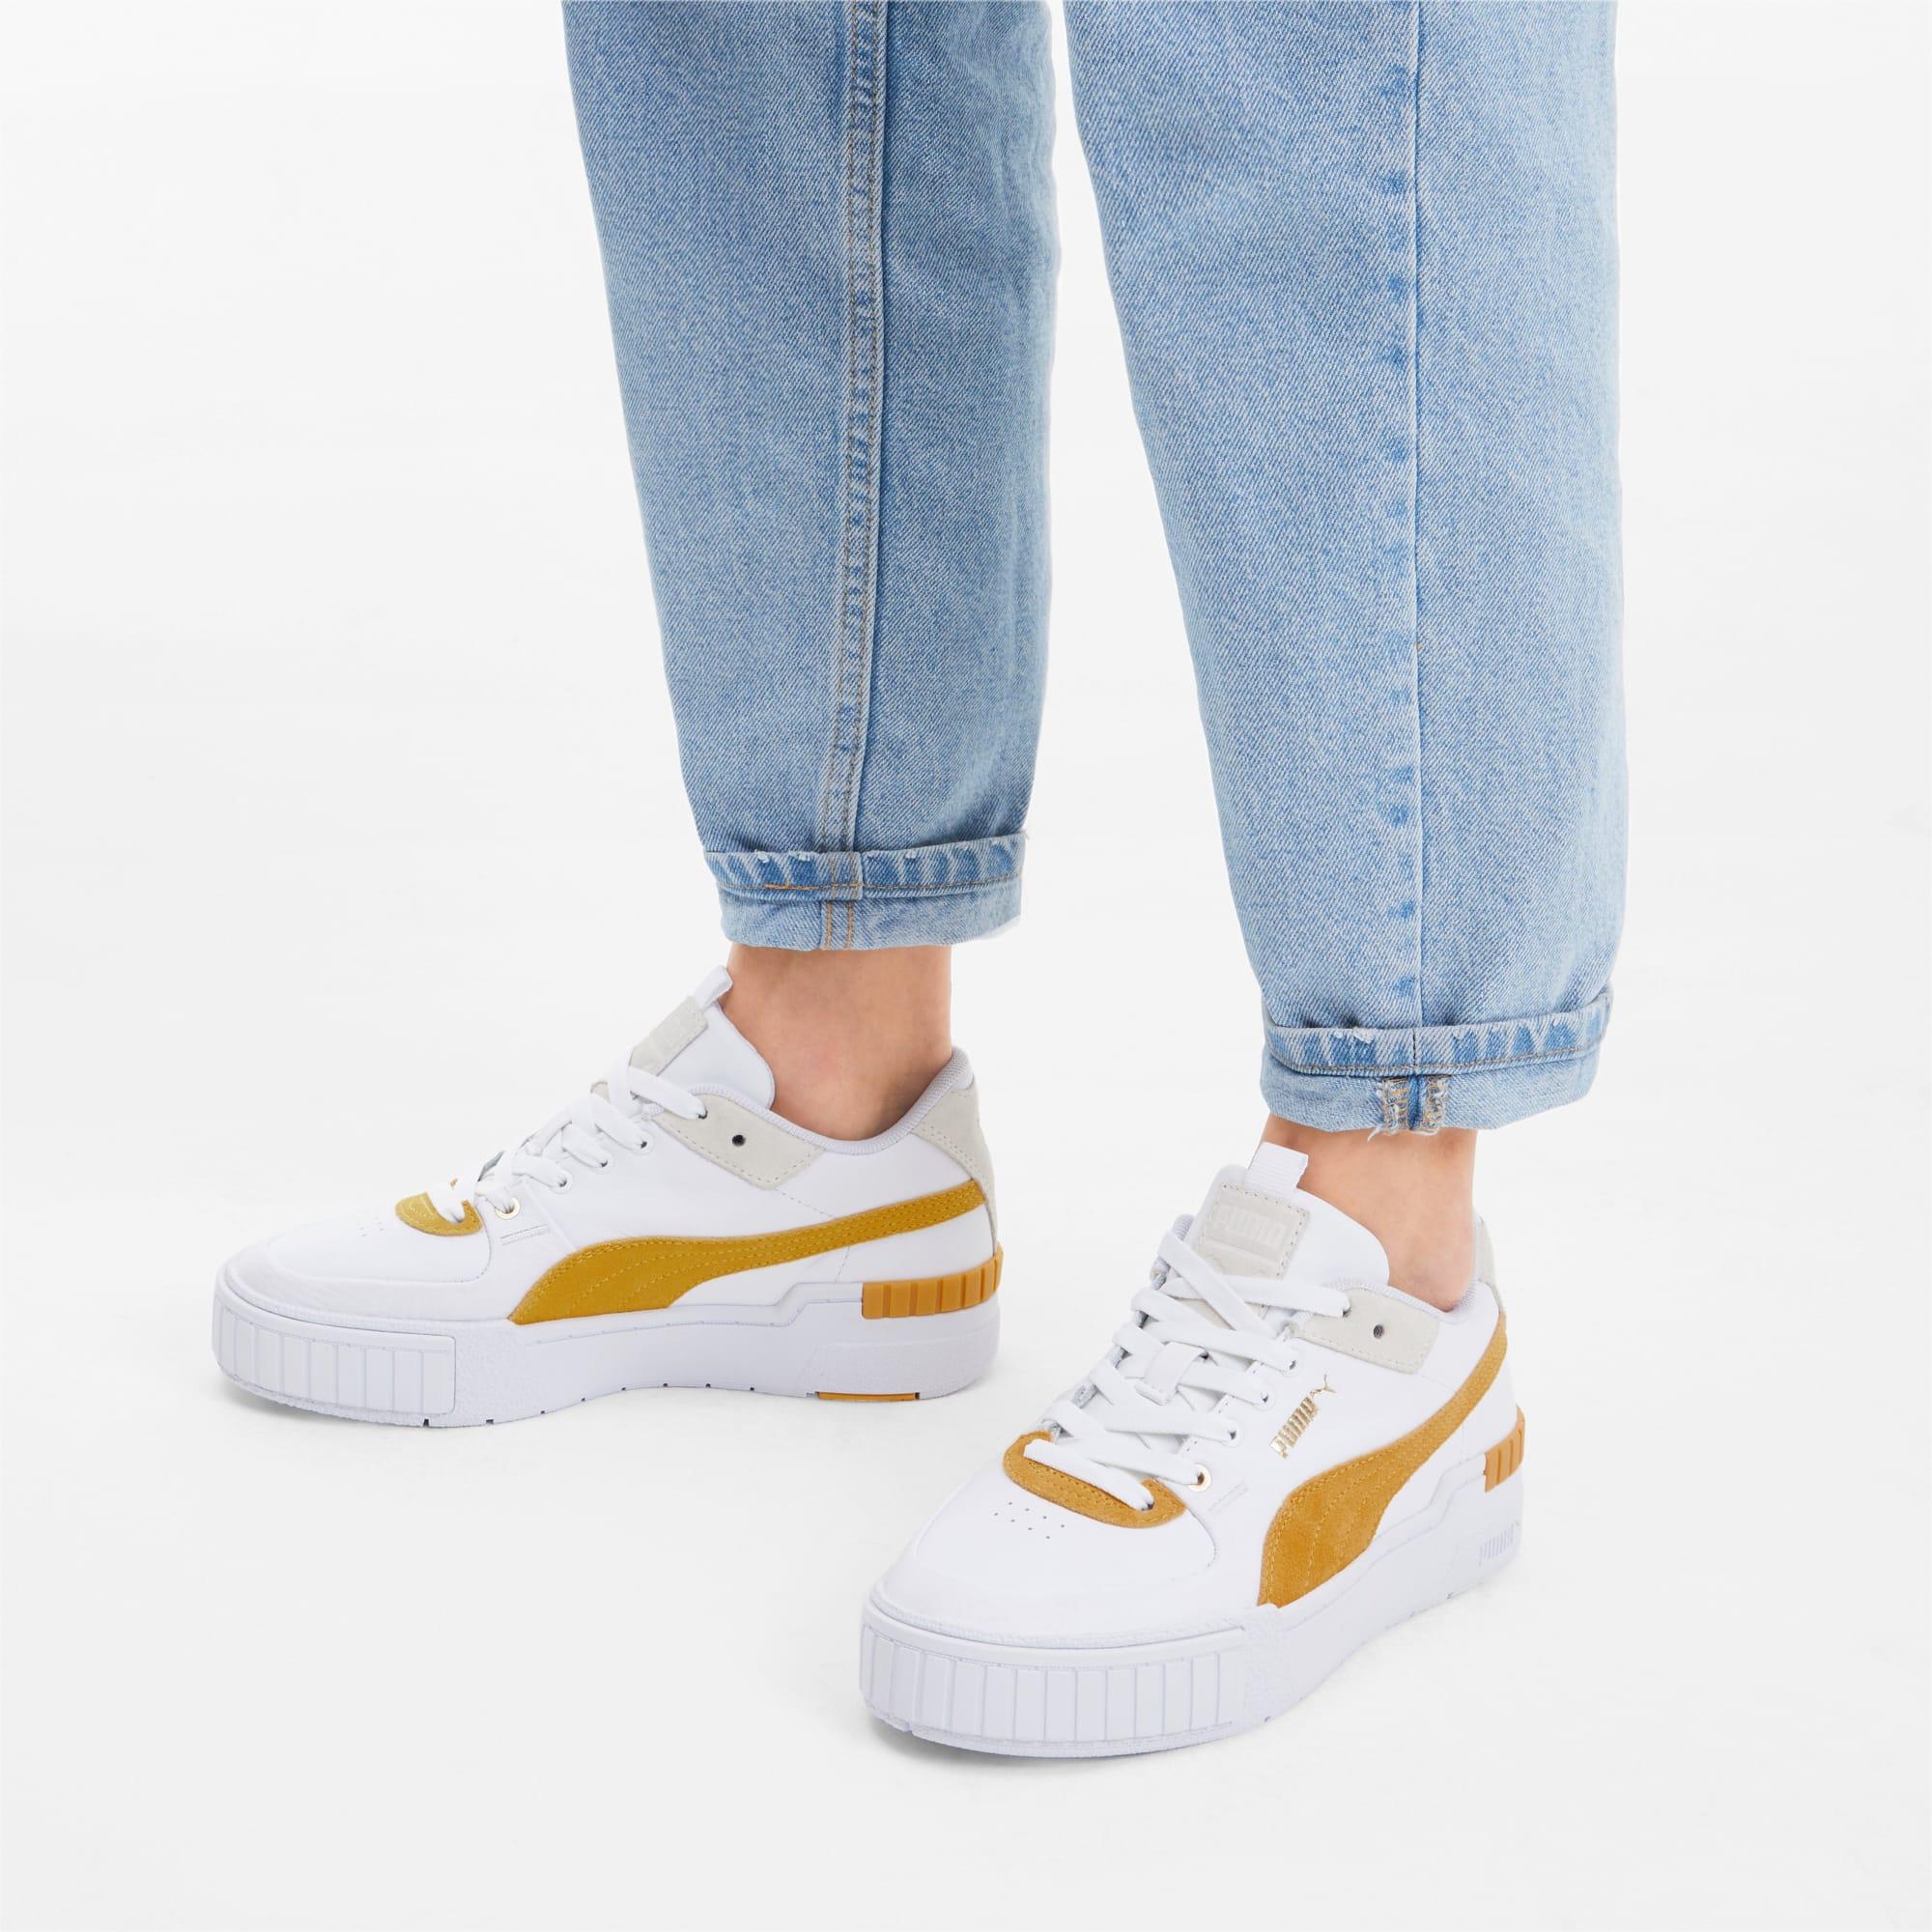 Cali Sport Heritage Women's Sneakers